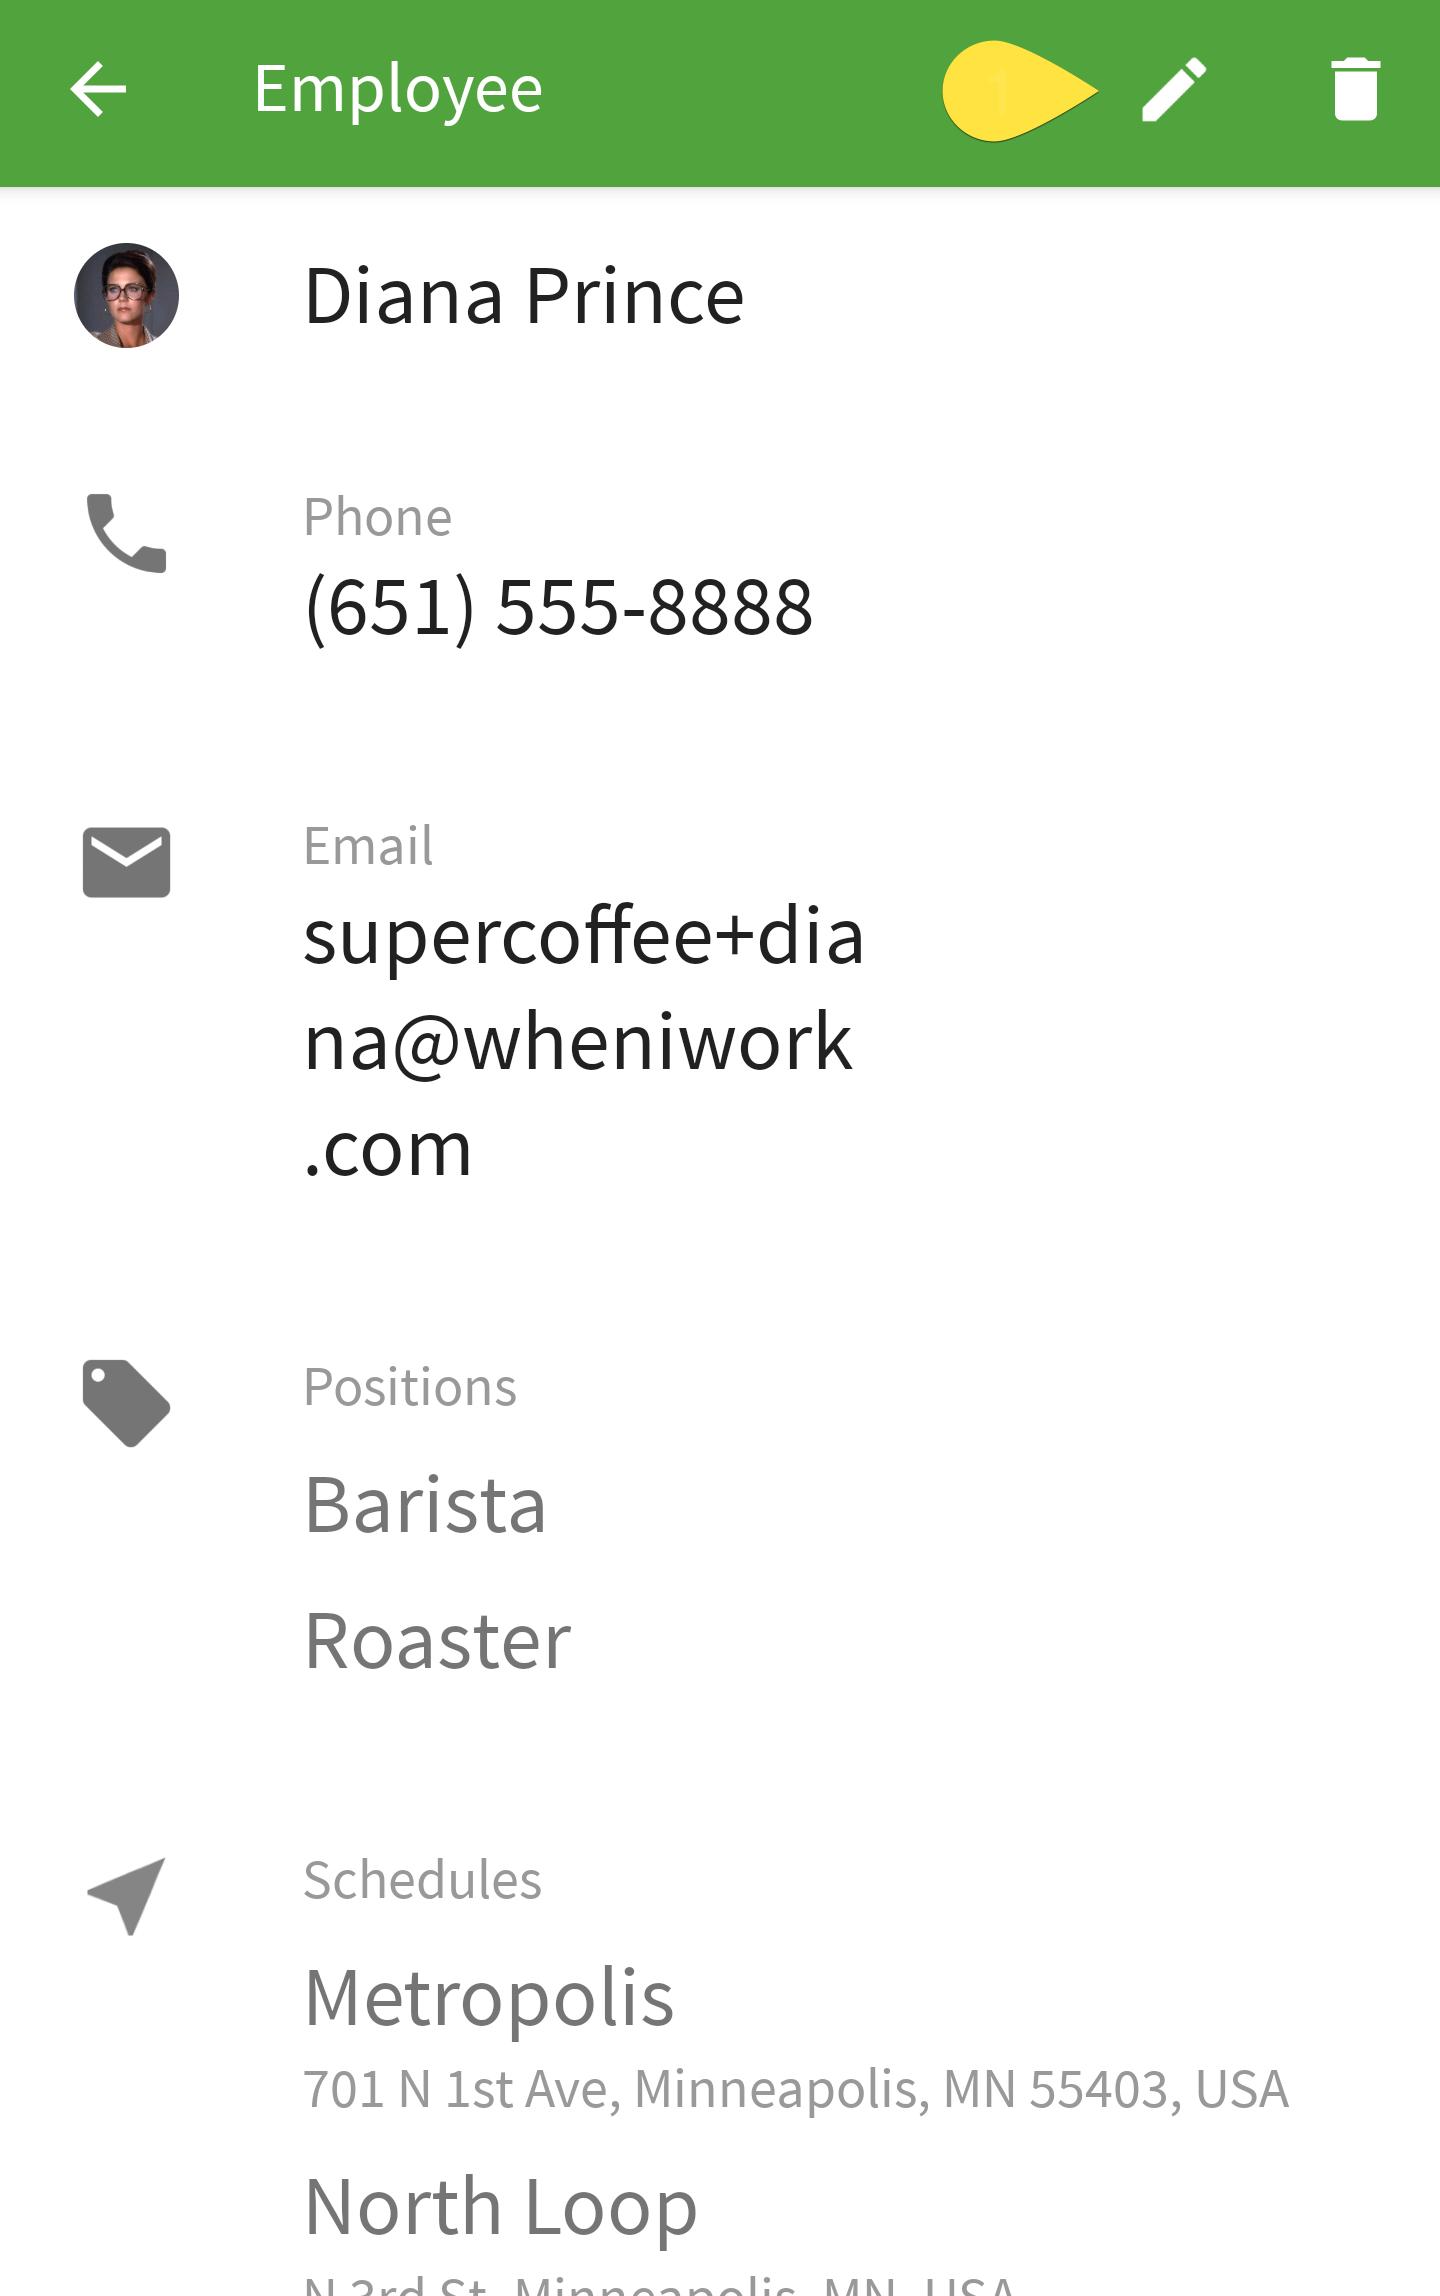 Employee edit button